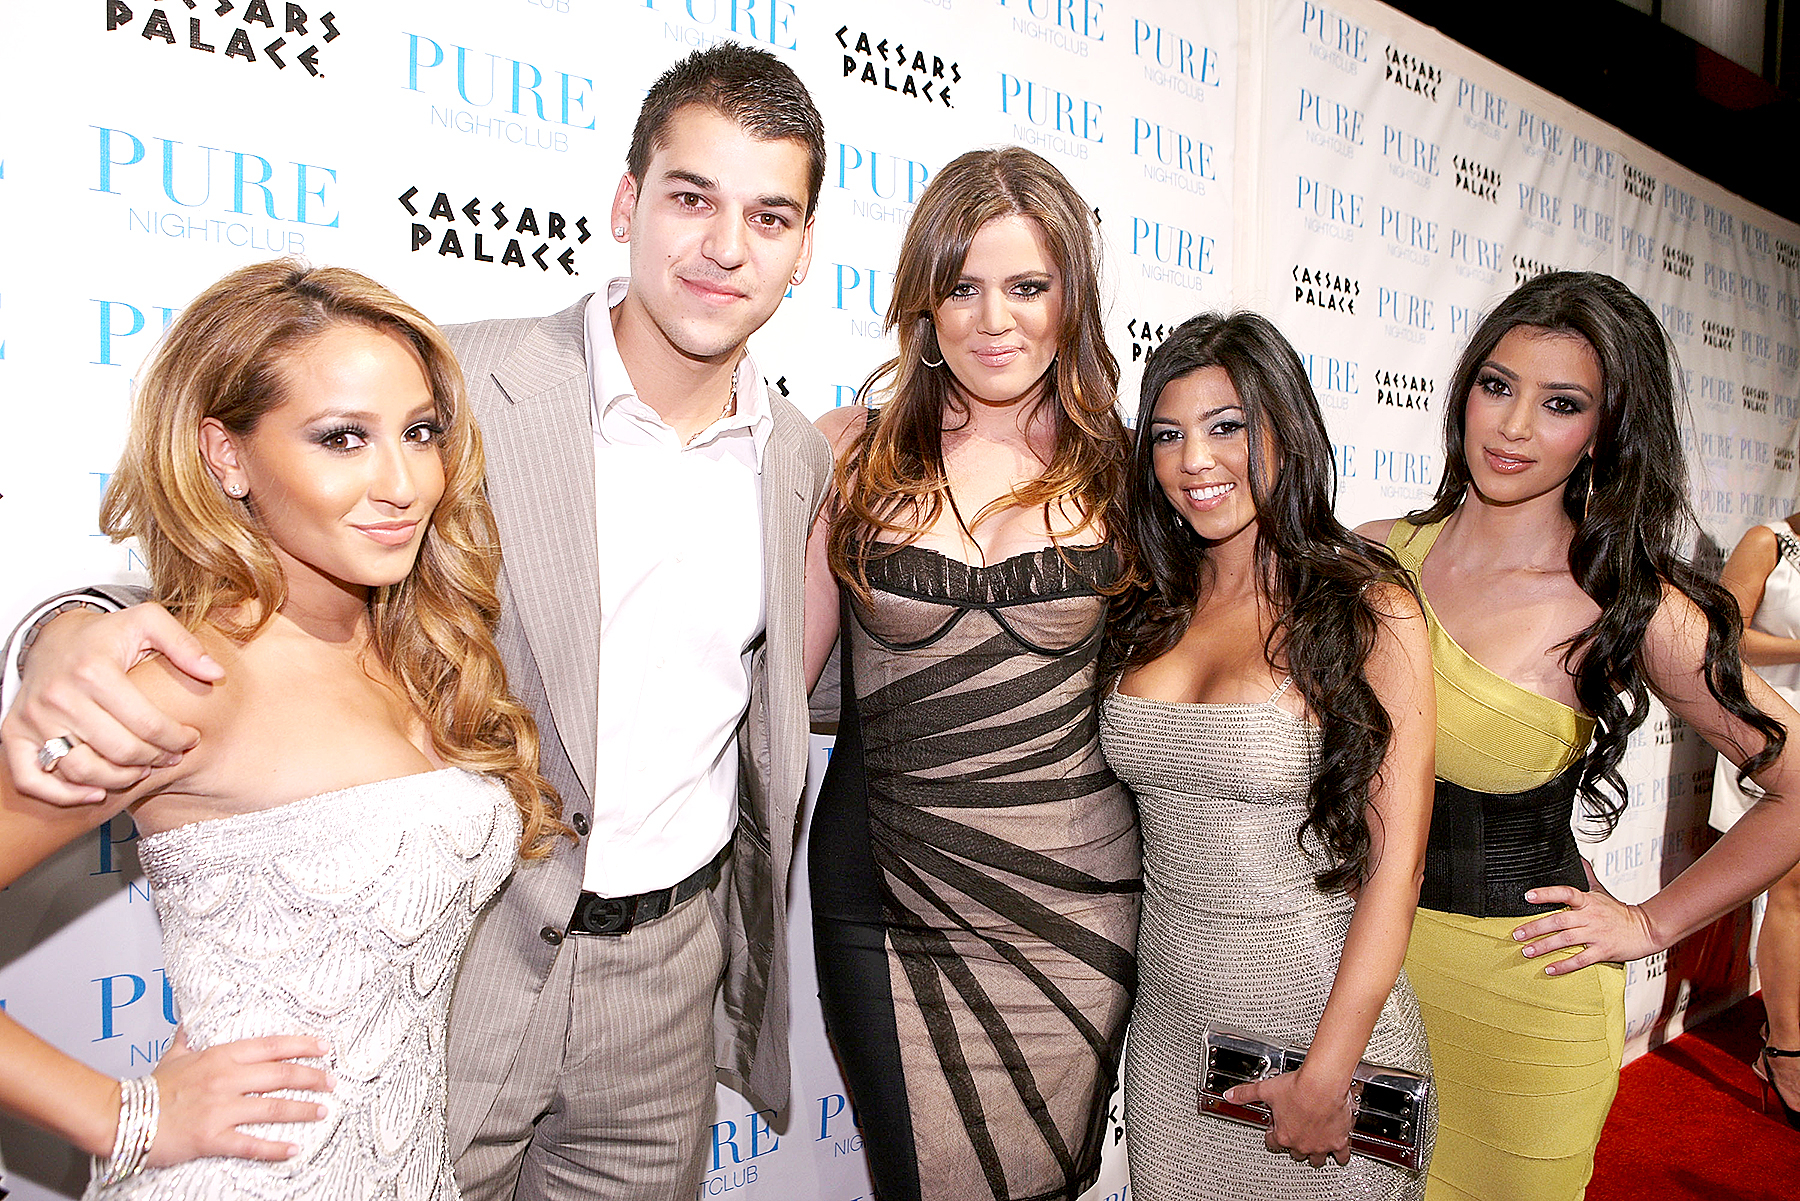 Adrienne Bailon, Robert Kardashian, Khloé Kardashian, Kourtney Kardashian and Kim Kardashian (from left) attend PURE Nightclub for Khloé Kardashian's birthday on June 27, 2008 in Las Vegas, NV.